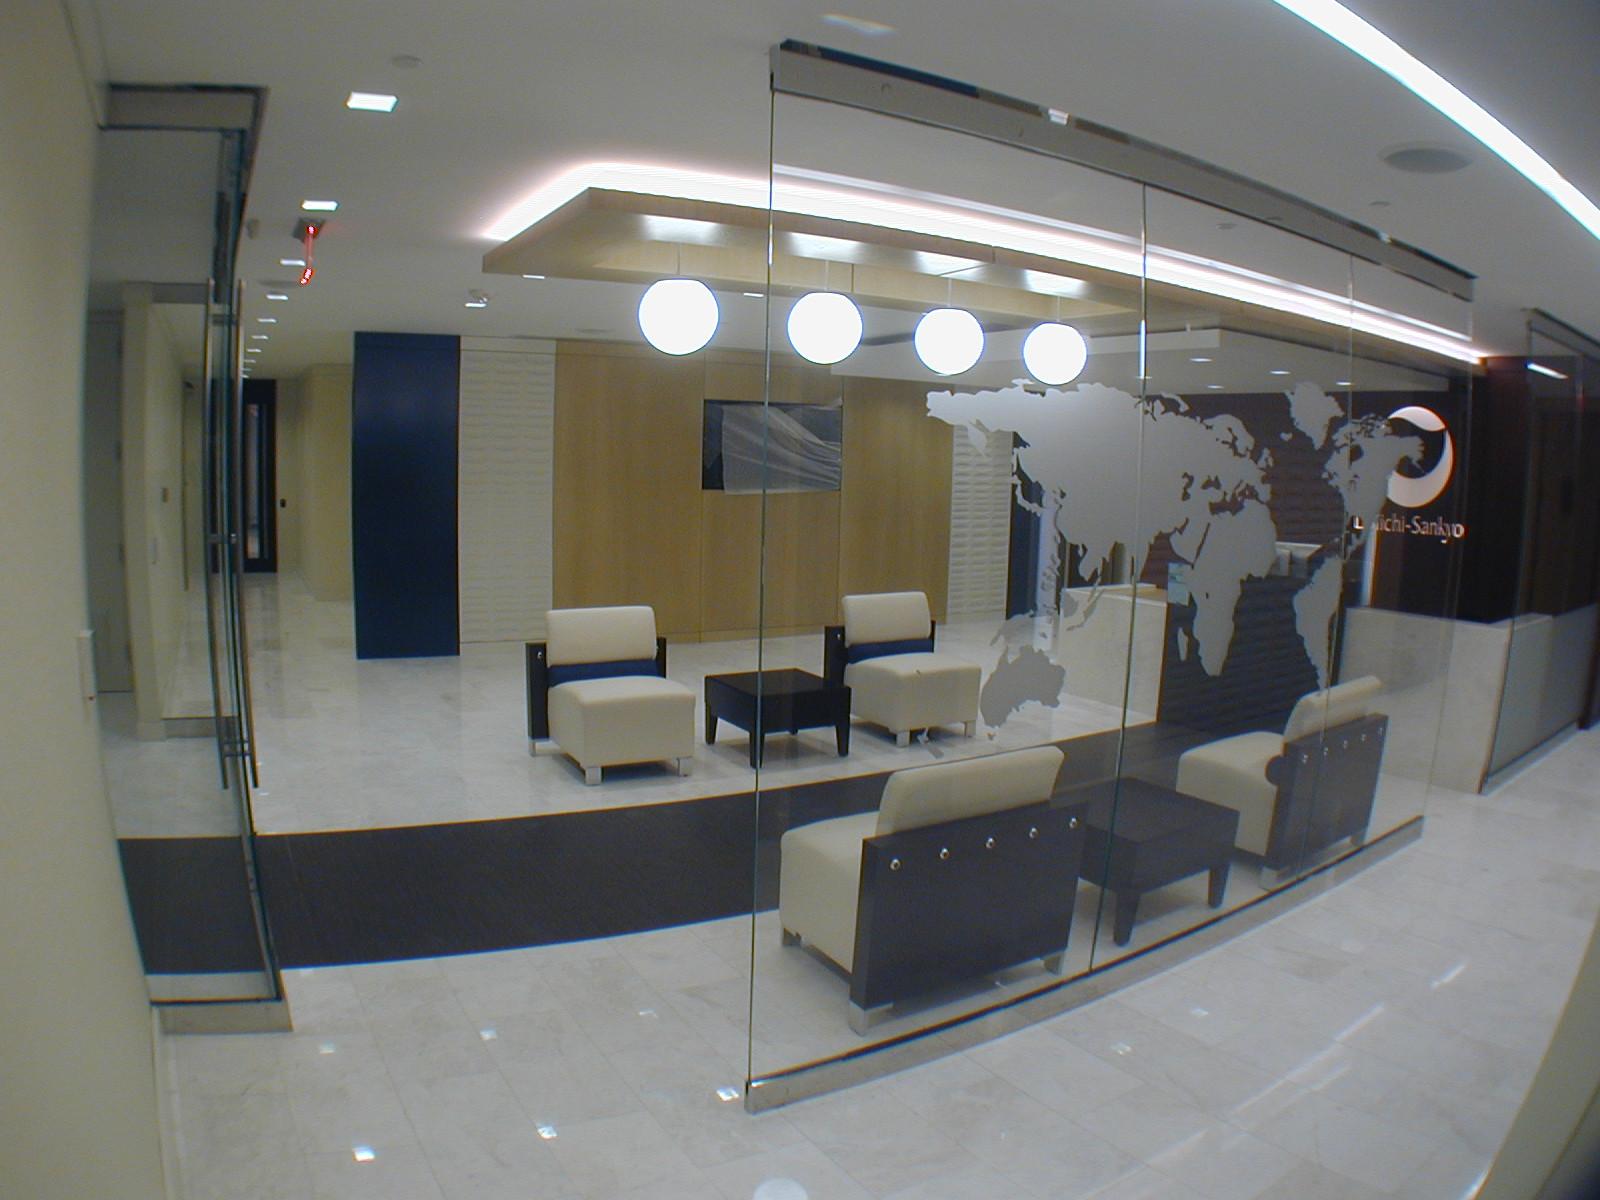 m_projects_0- Old Jobs_Daiichi Sankyo_Pics_P1010145.JPG